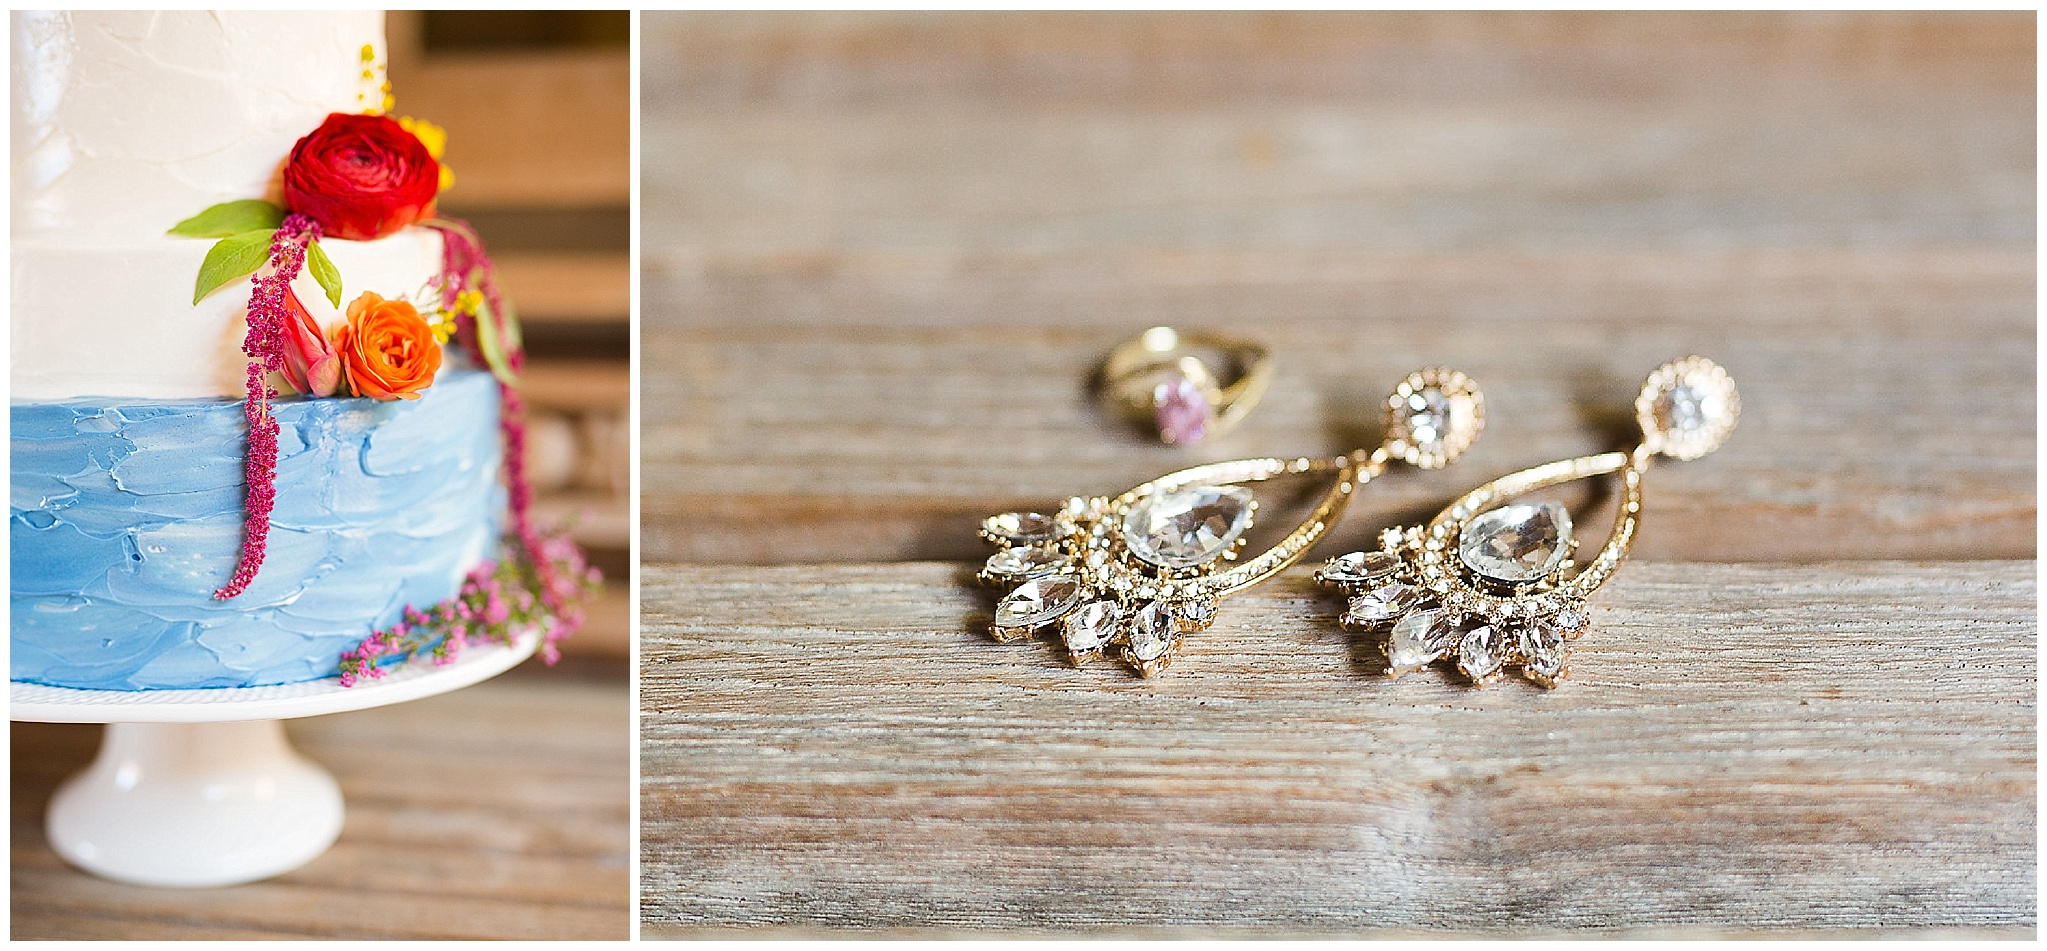 wedding-inspiration-houston-texas-bride-blog_0024.jpg